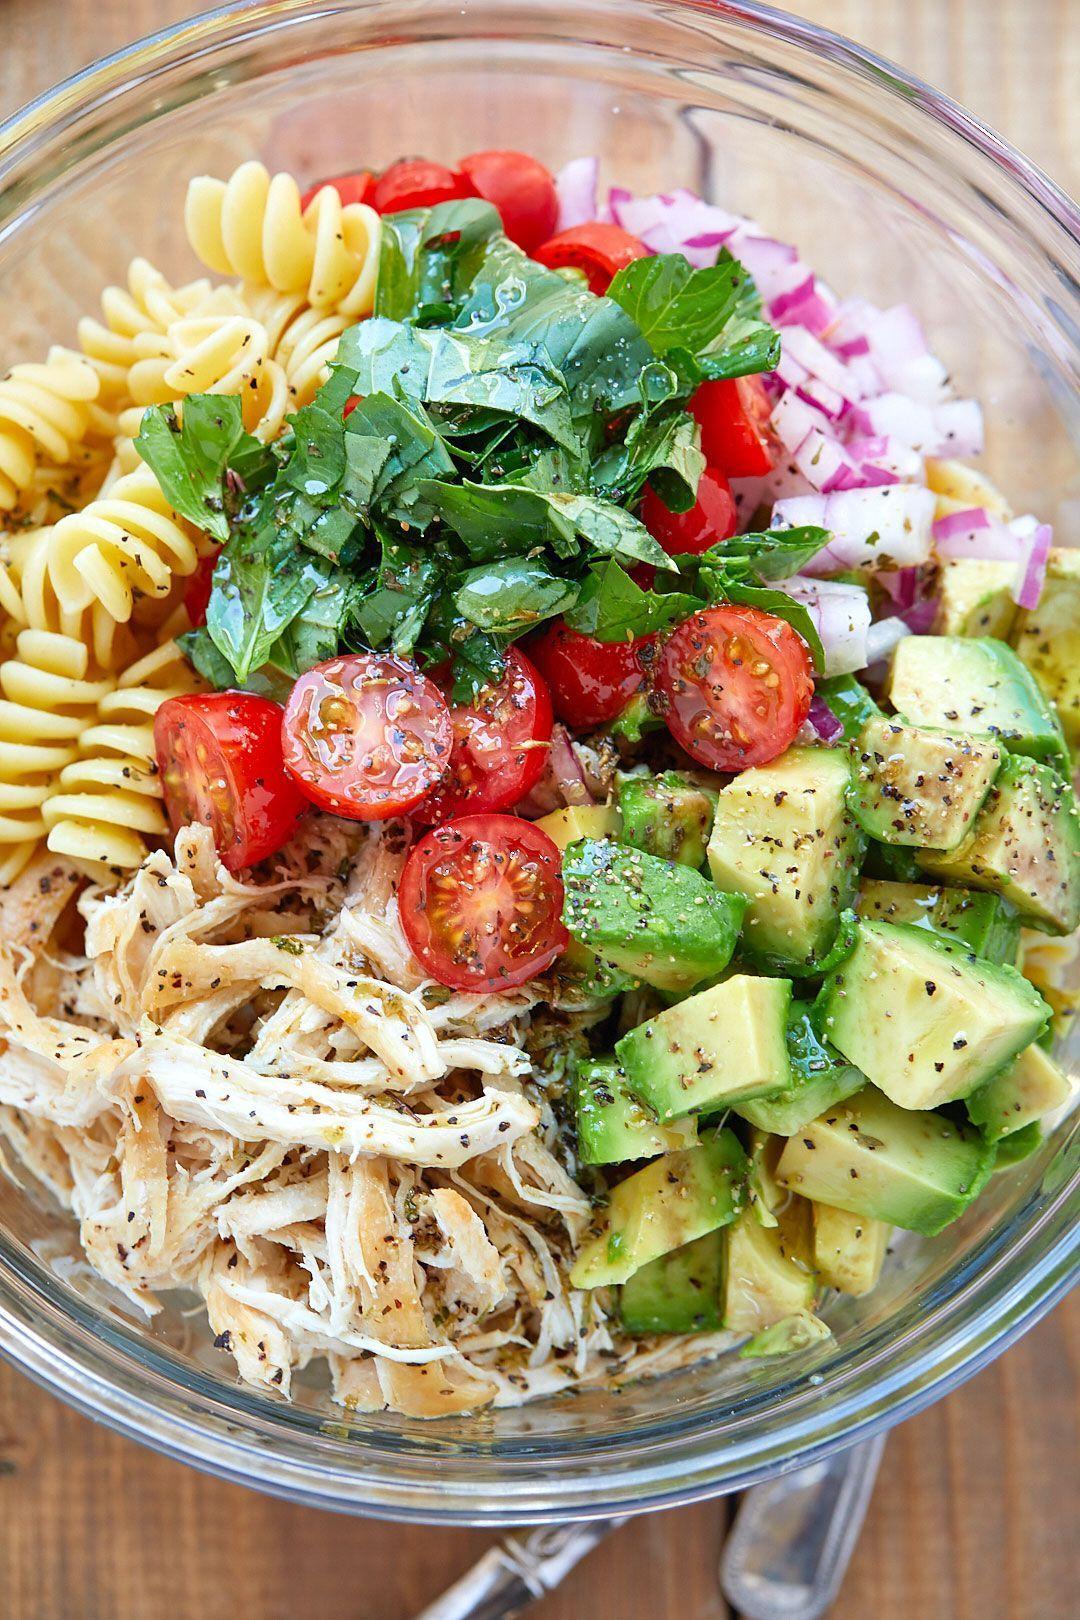 Gesunder Hühnernudelsalat mit Avocado, Tomate und Basilikum #beefhealthyrecipes